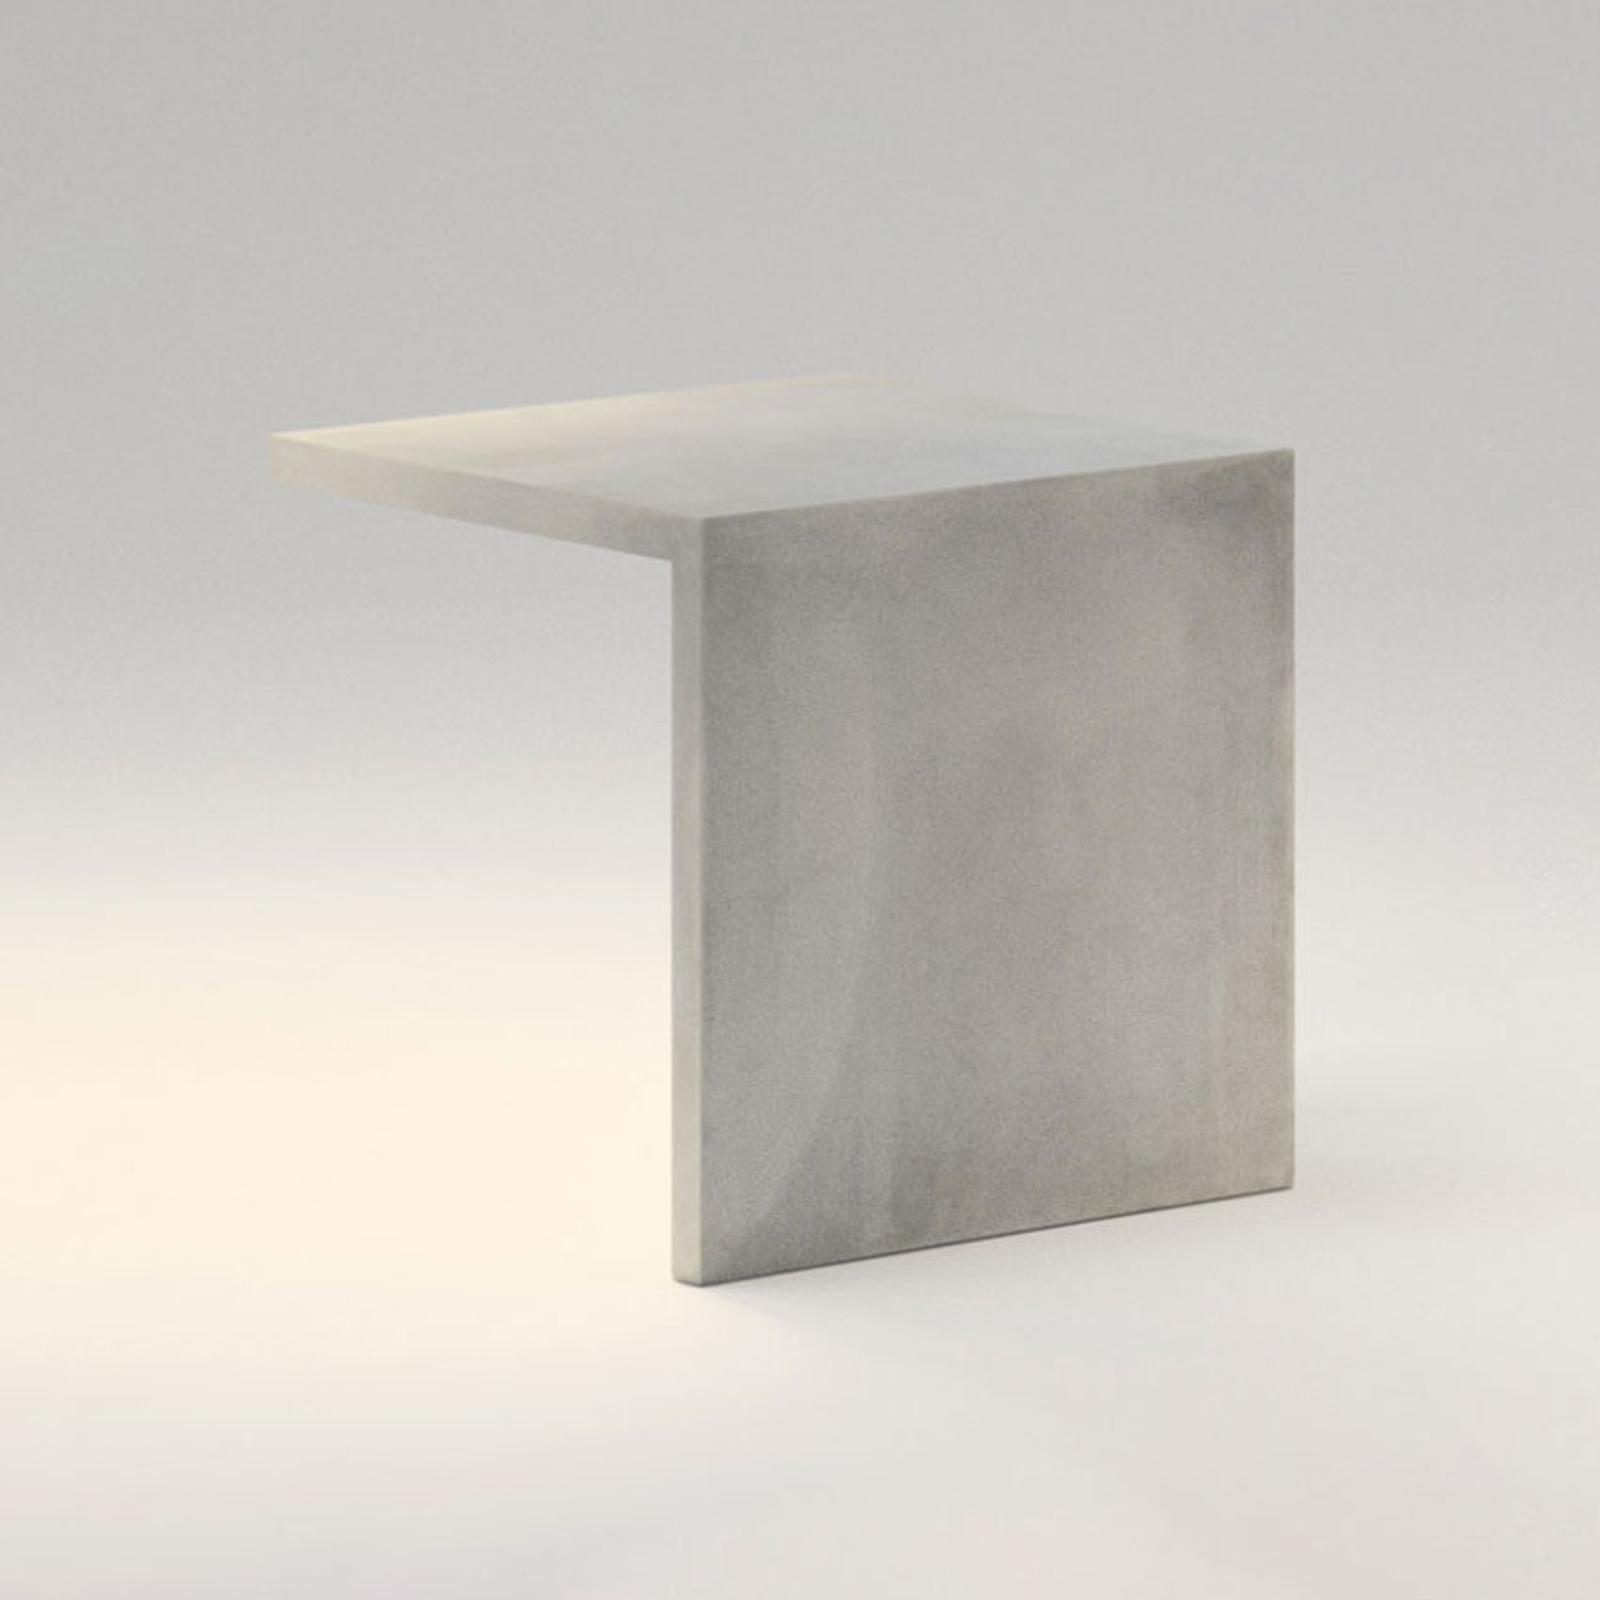 Vibia Empty 4135 ulkovalaisin betonista, 25 cm